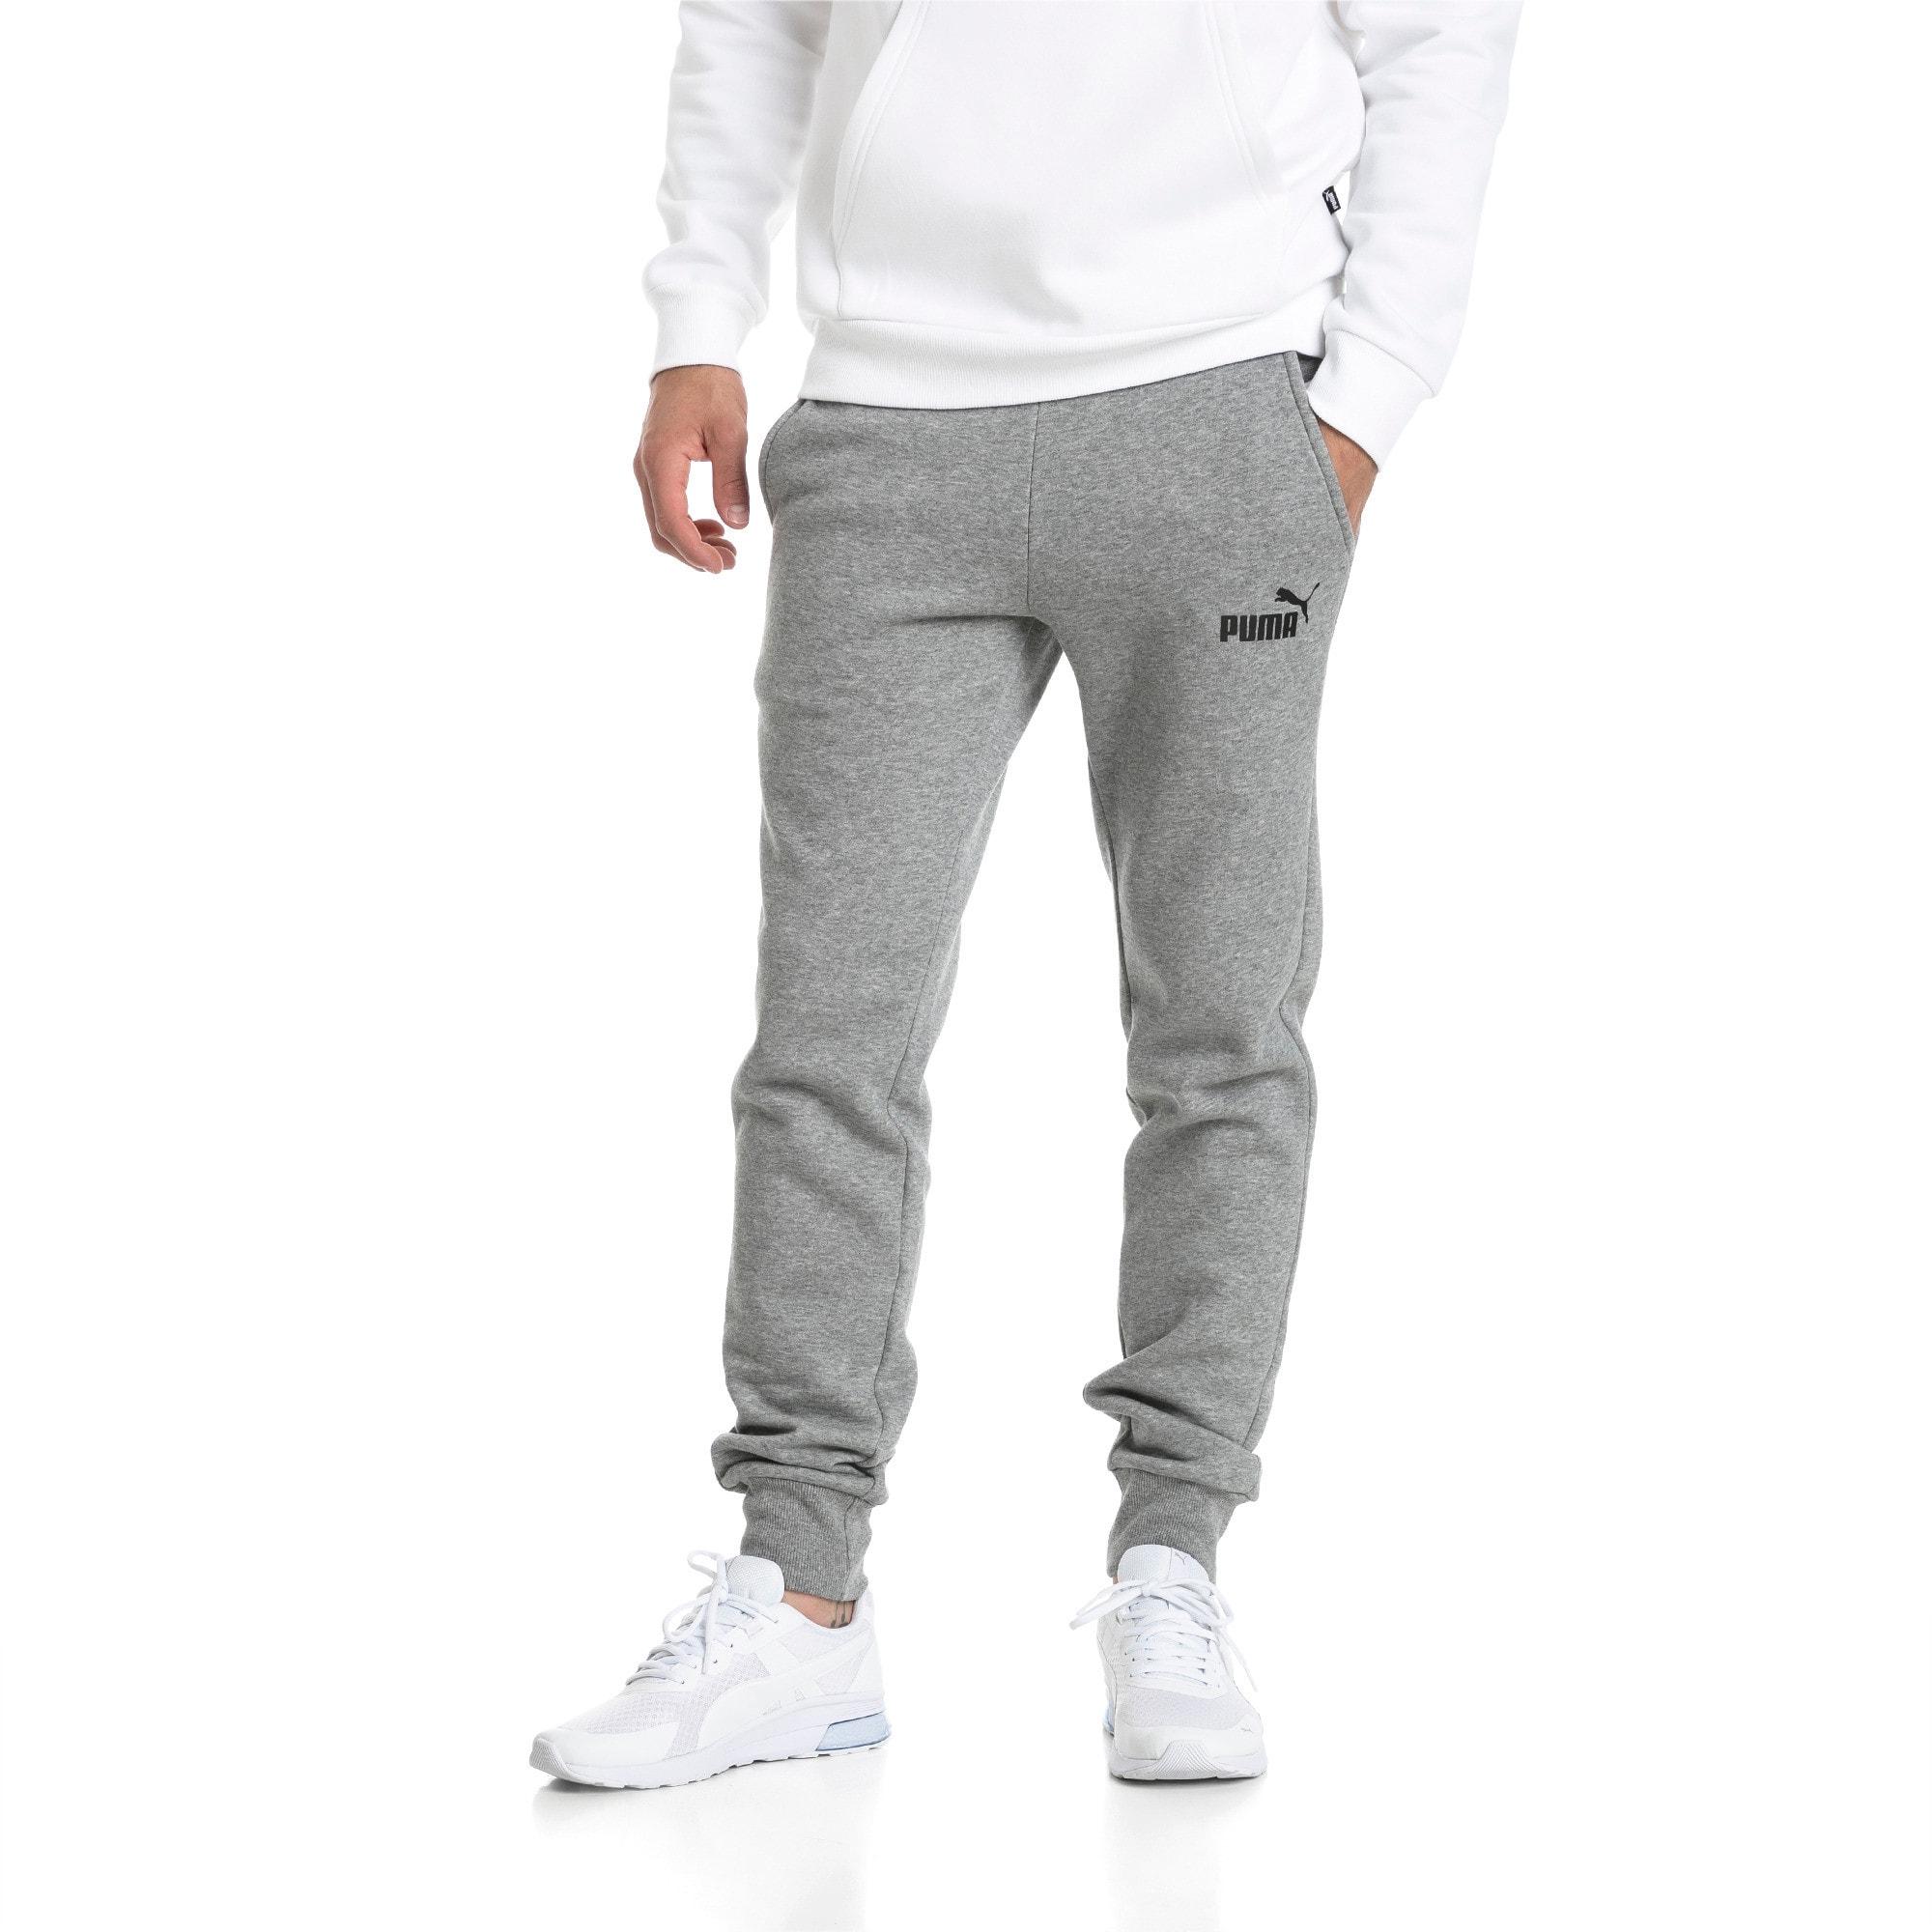 Pantalones Deporte de hombre Puma polar ¡Compara 9 productos